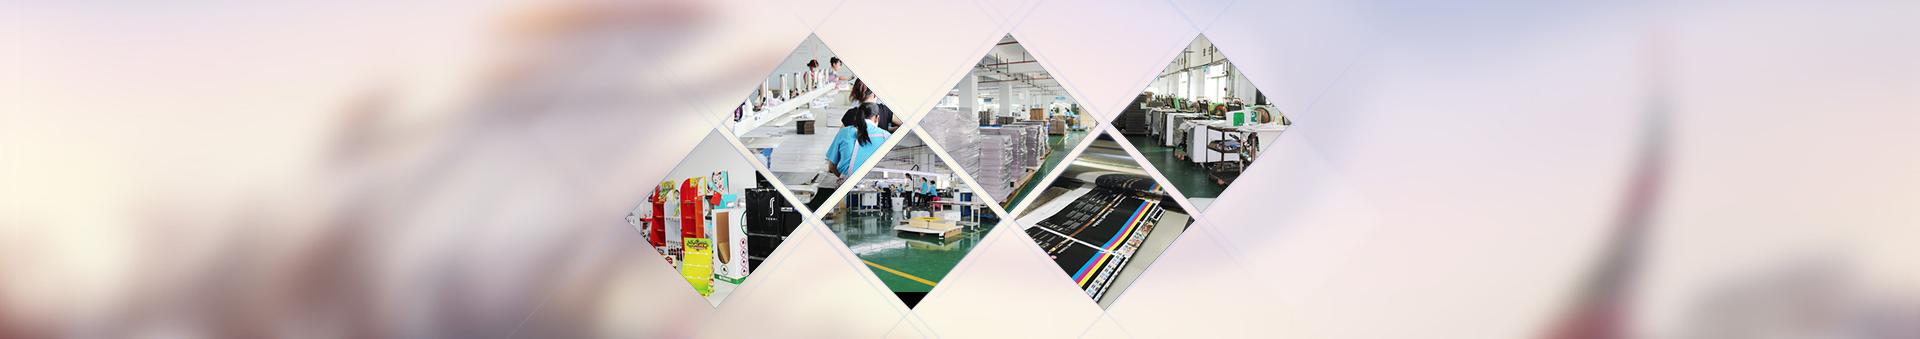 Professional Manufacturing Flow From Safeka Display Co,Ltd-SAFEKA-img